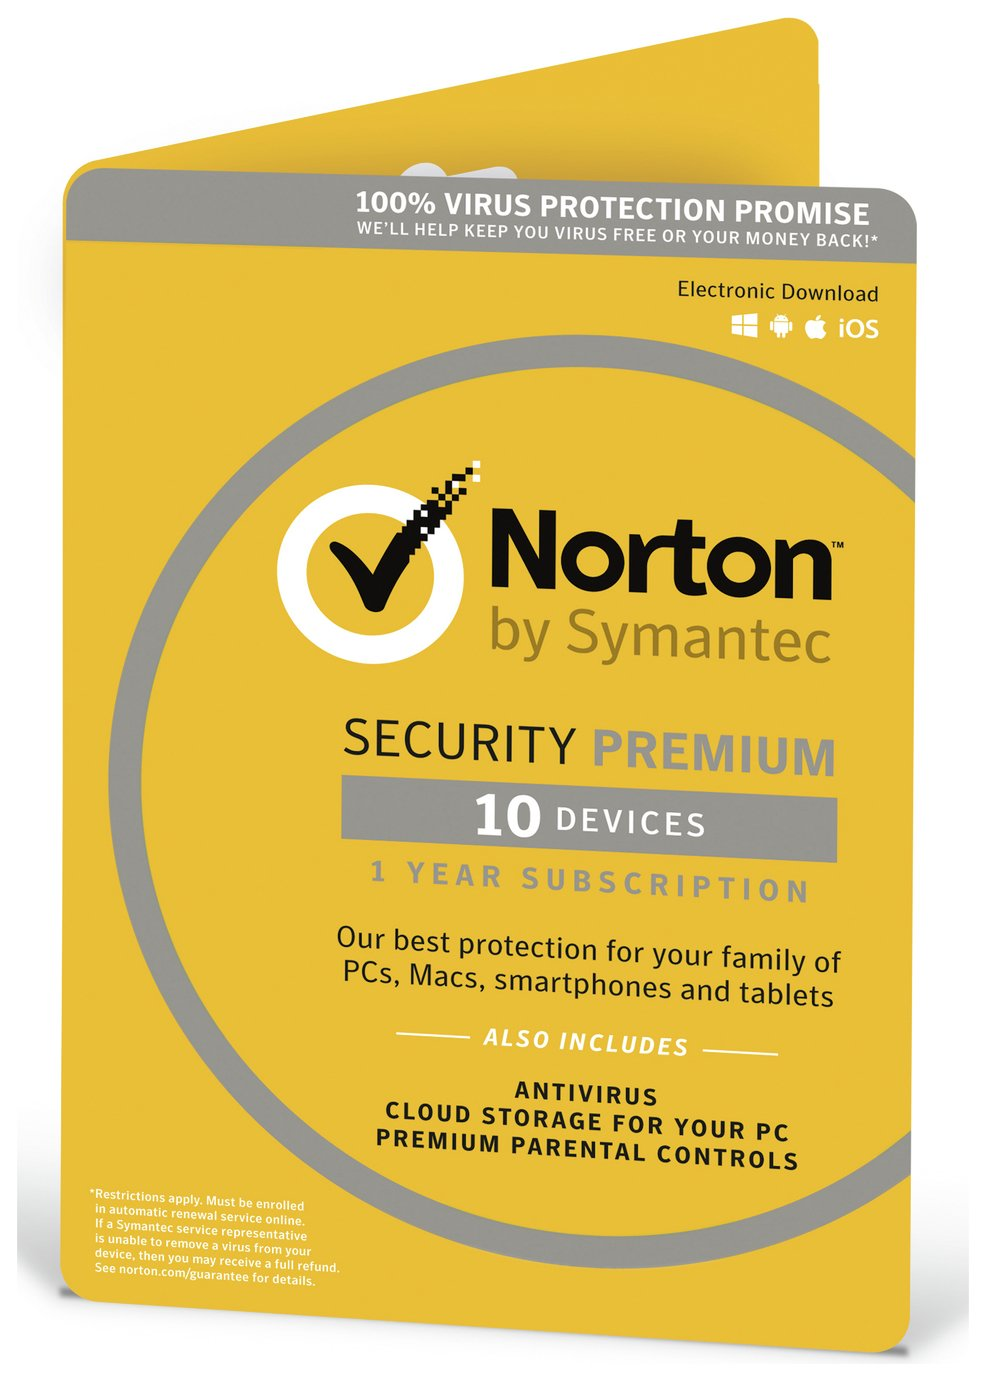 Symantec Norton - Security Premium with Backup - 1 User/10 Devices